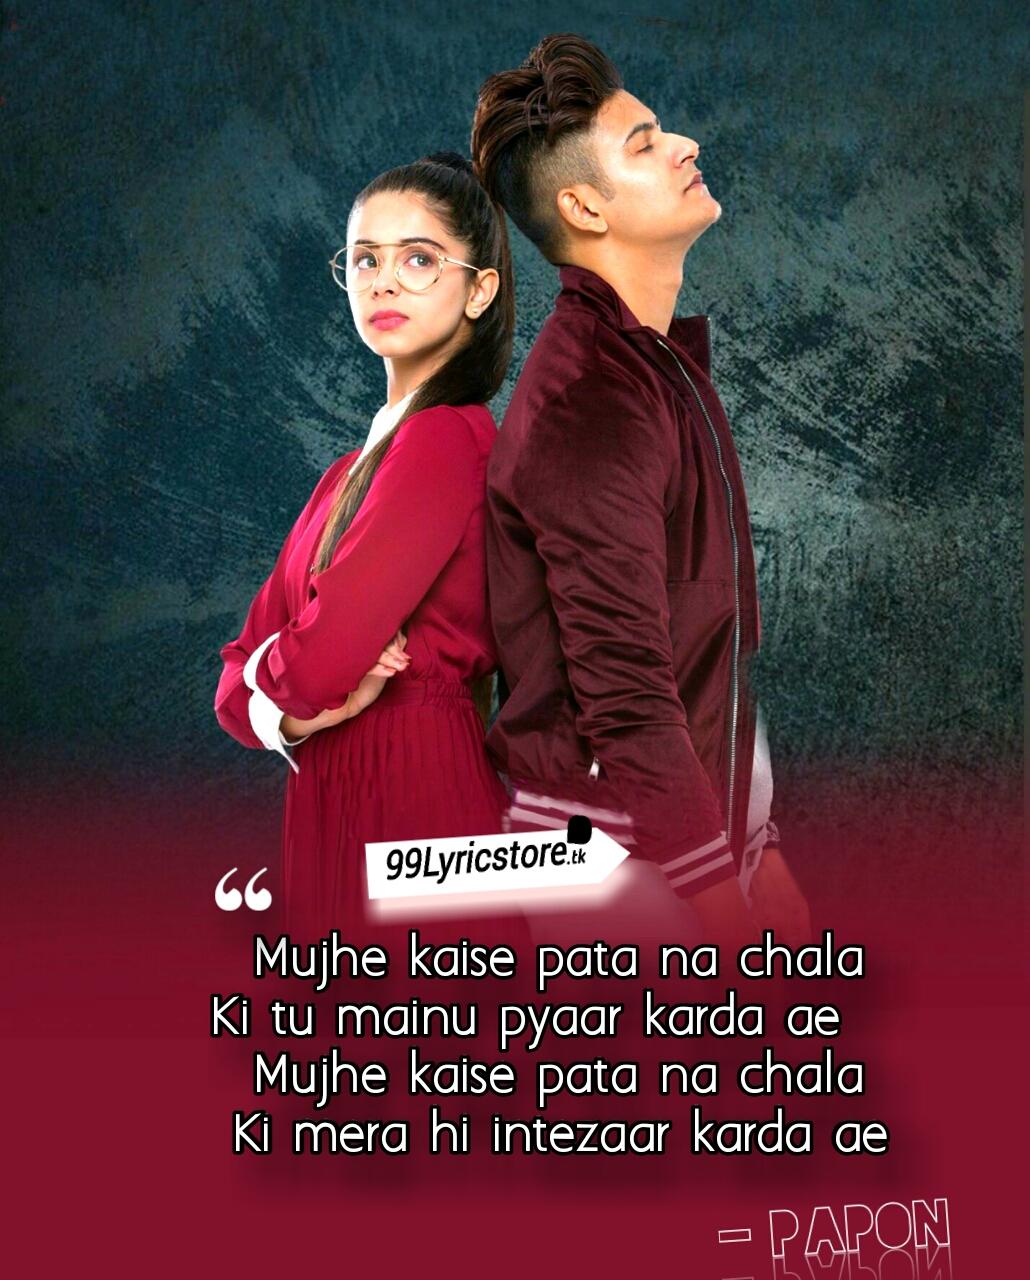 Papon New Song Lyrics, Papon latest Song 2018, Manjul Actress images, Manjul Song Lyrics, Rits Badiani Song Lyrics, MB Music Song Lyrics